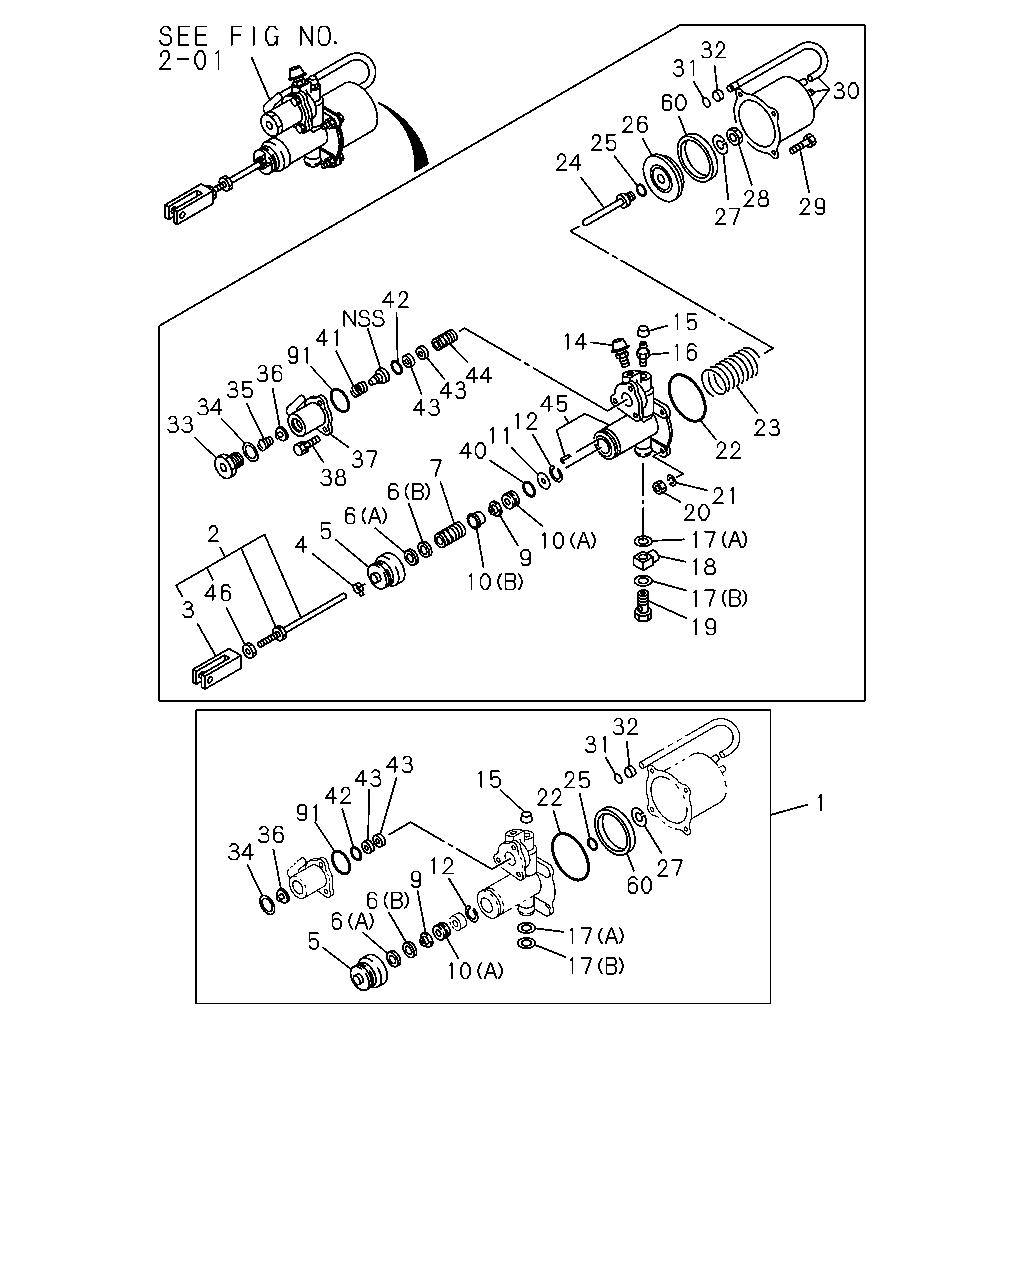 c e 10660 cxz rhd 90 95 2 clutch transmission trans axle OCD Diagram code